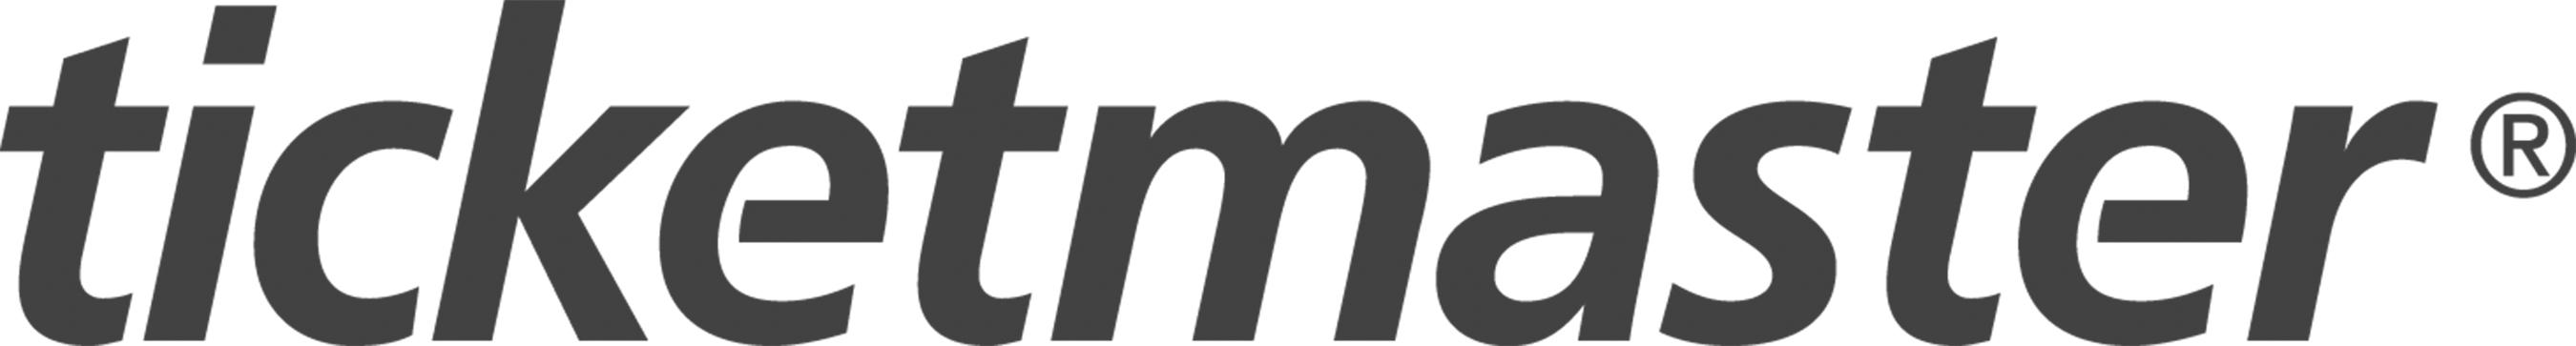 Ticketmaster logo. (PRNewsFoto/Ticketmaster) (PRNewsFoto/)